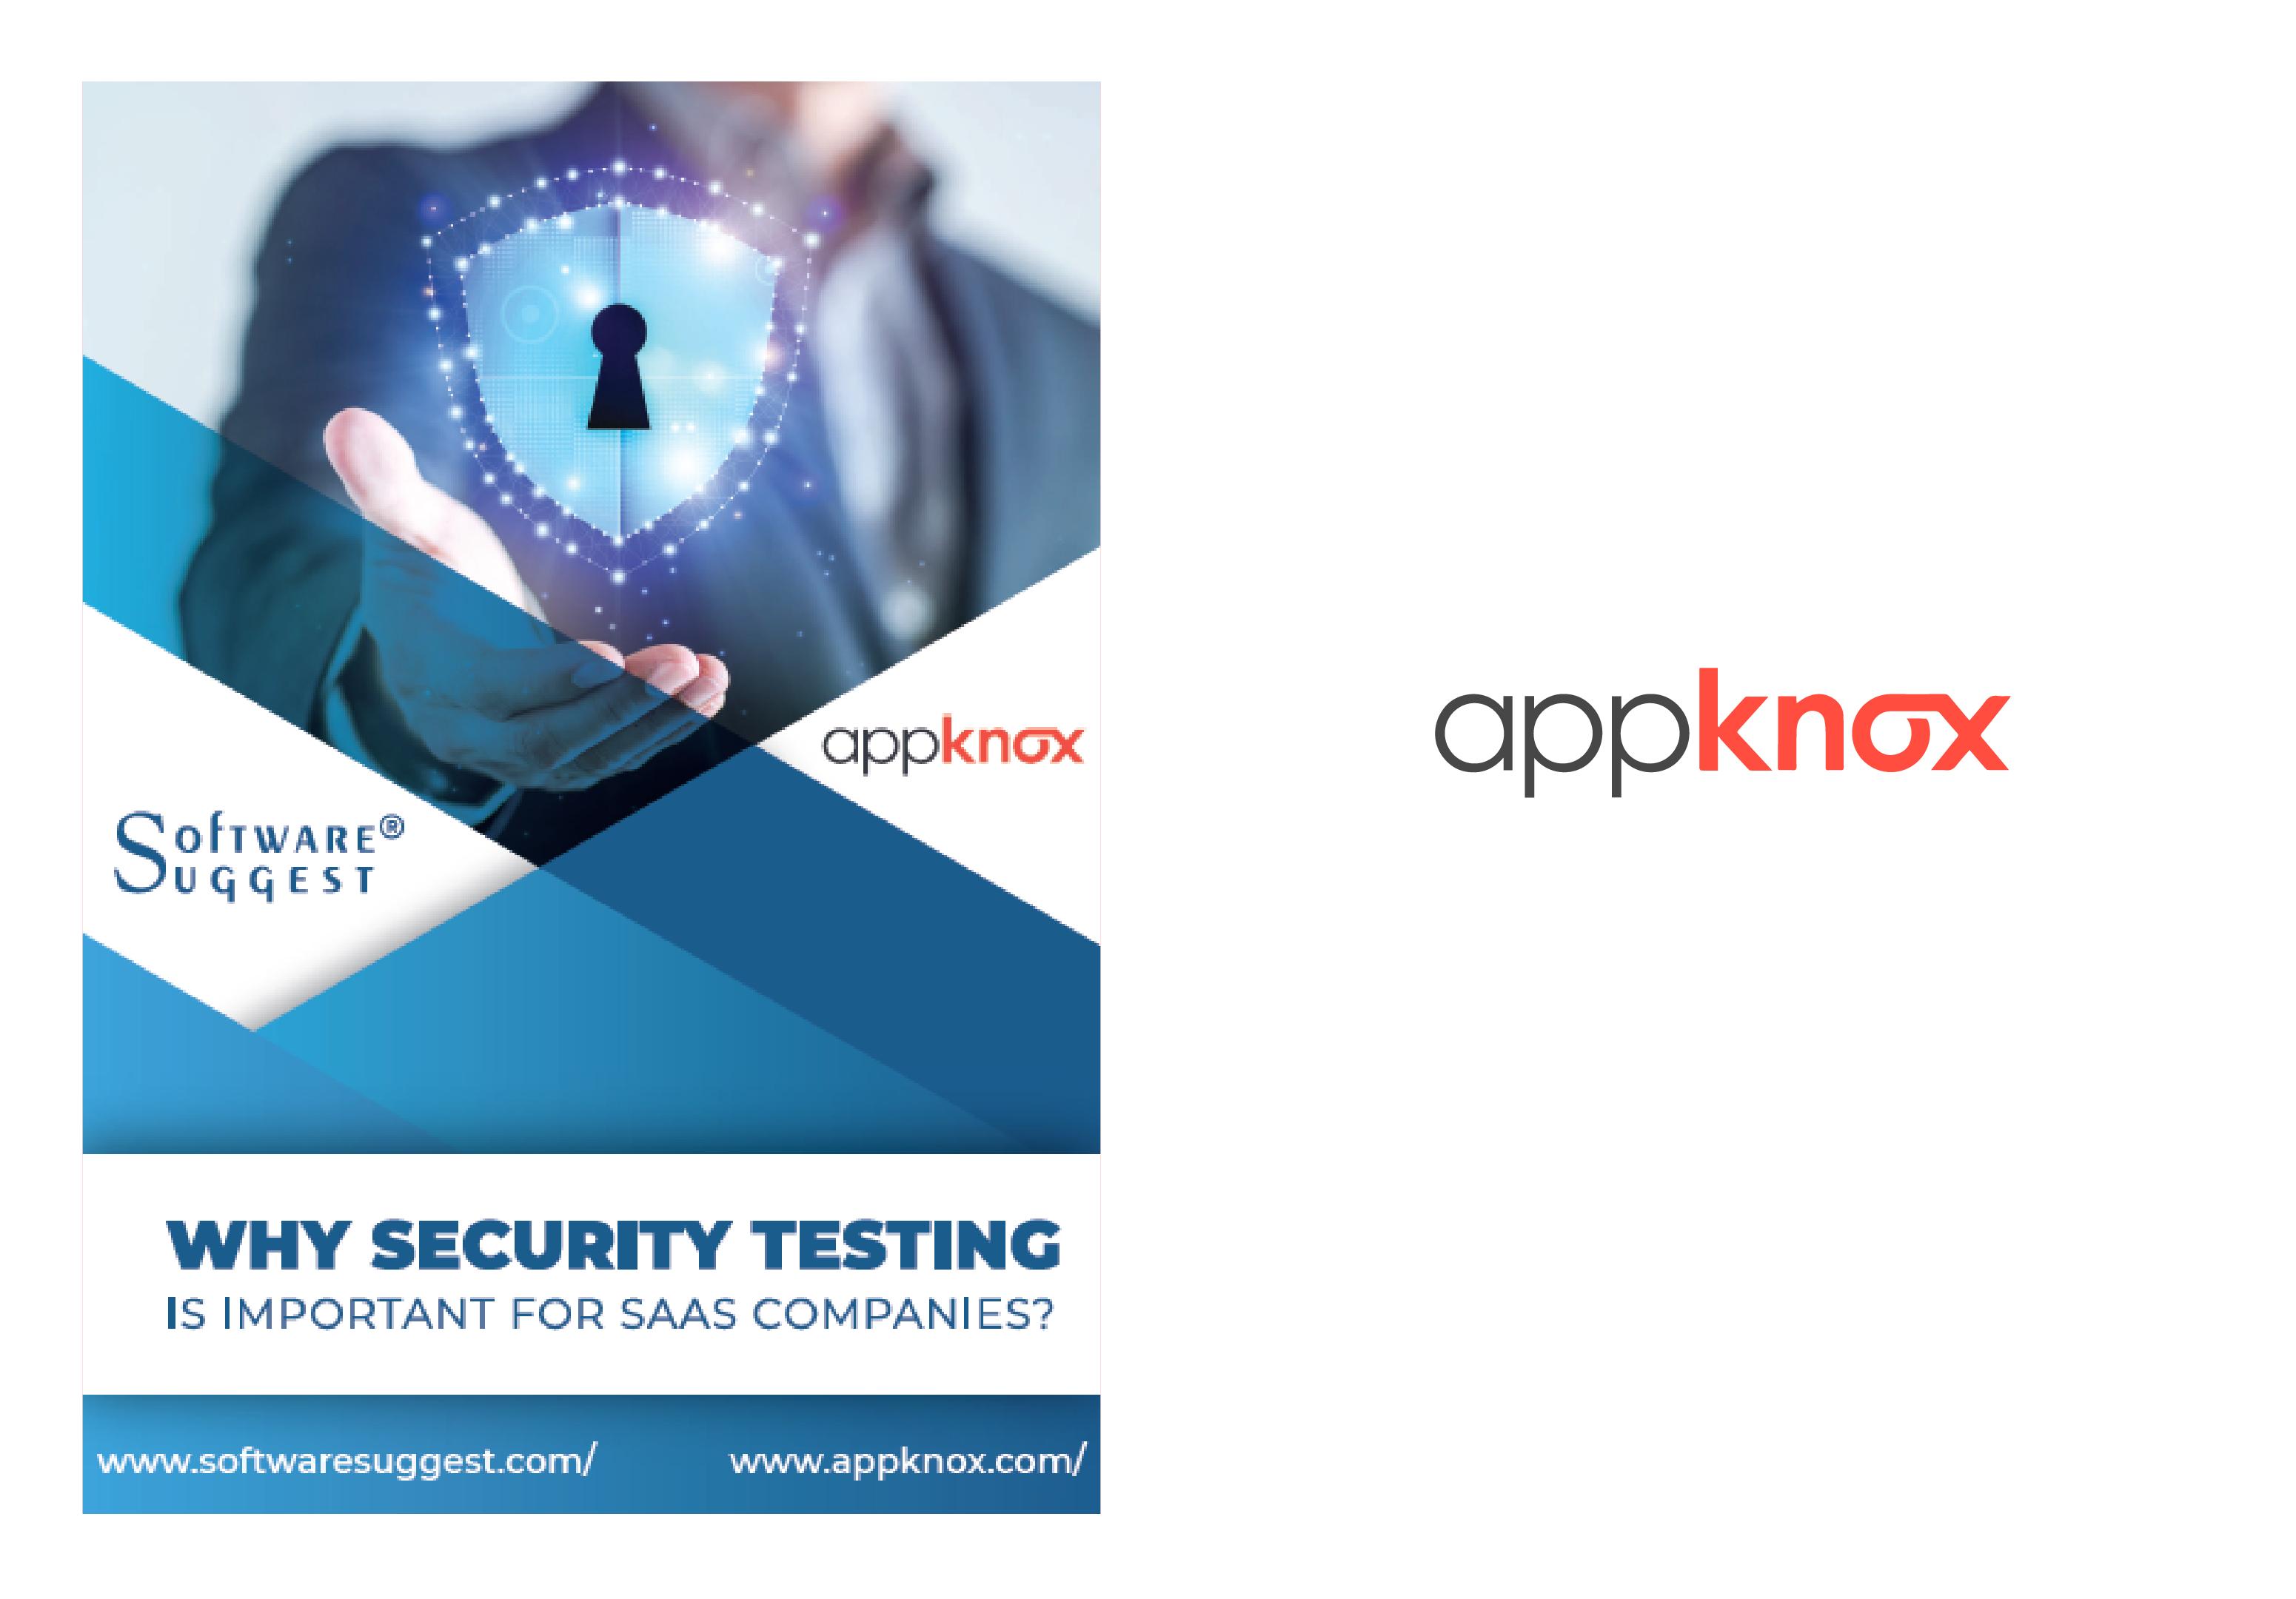 WHITE PAPER - Software Suggest - Appknox Saas Security handbook-01